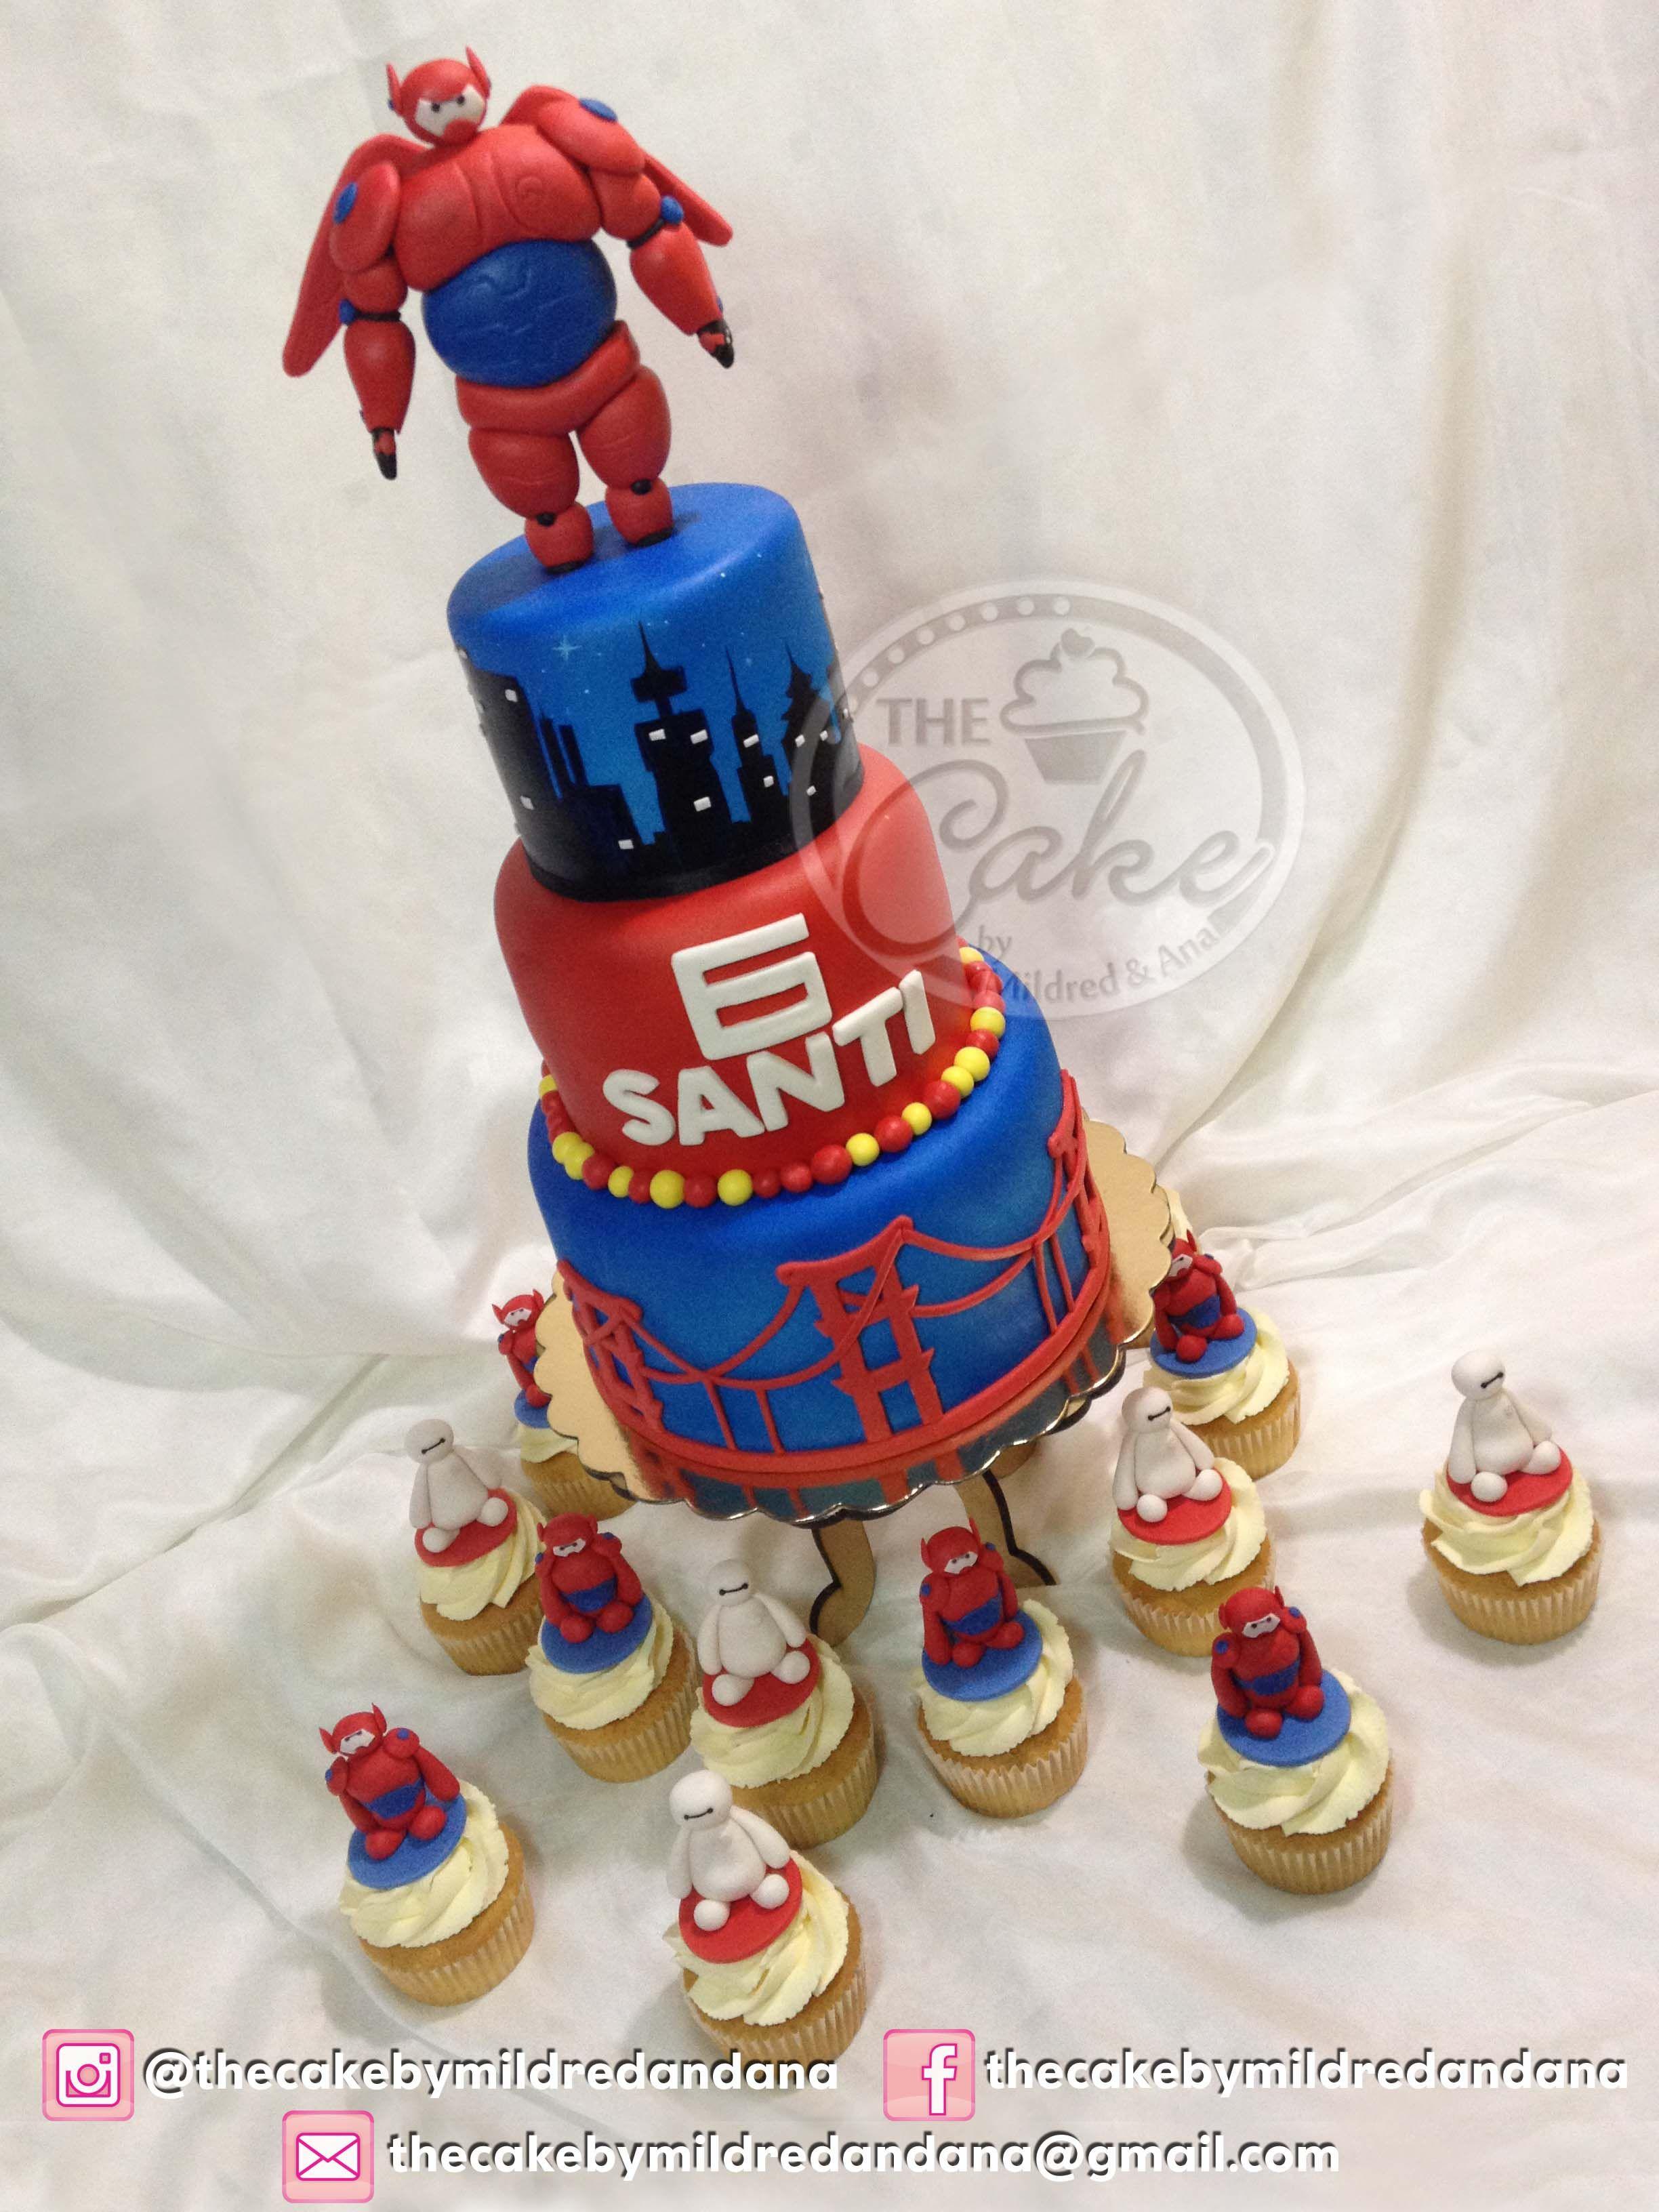 Big Hero Cake - Puerto Ordaz/Venezuela